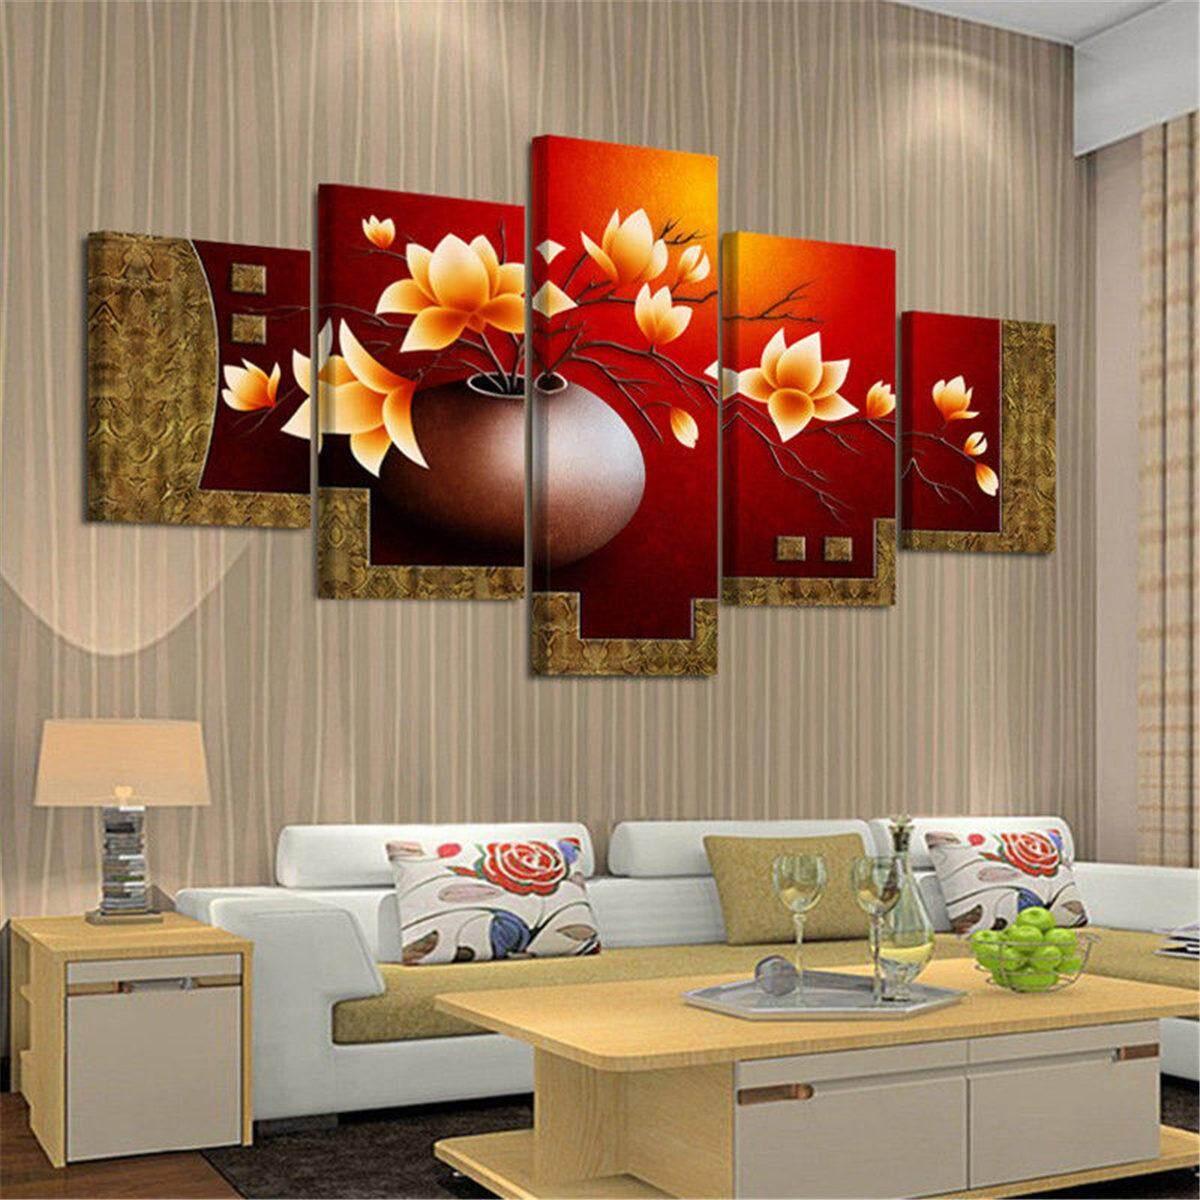 Unframed 5 Piece Gambar Vas Bunga Kanvas Seni Cetak Minyak Lukisan Dinding Gambar untuk Ruang Tamu